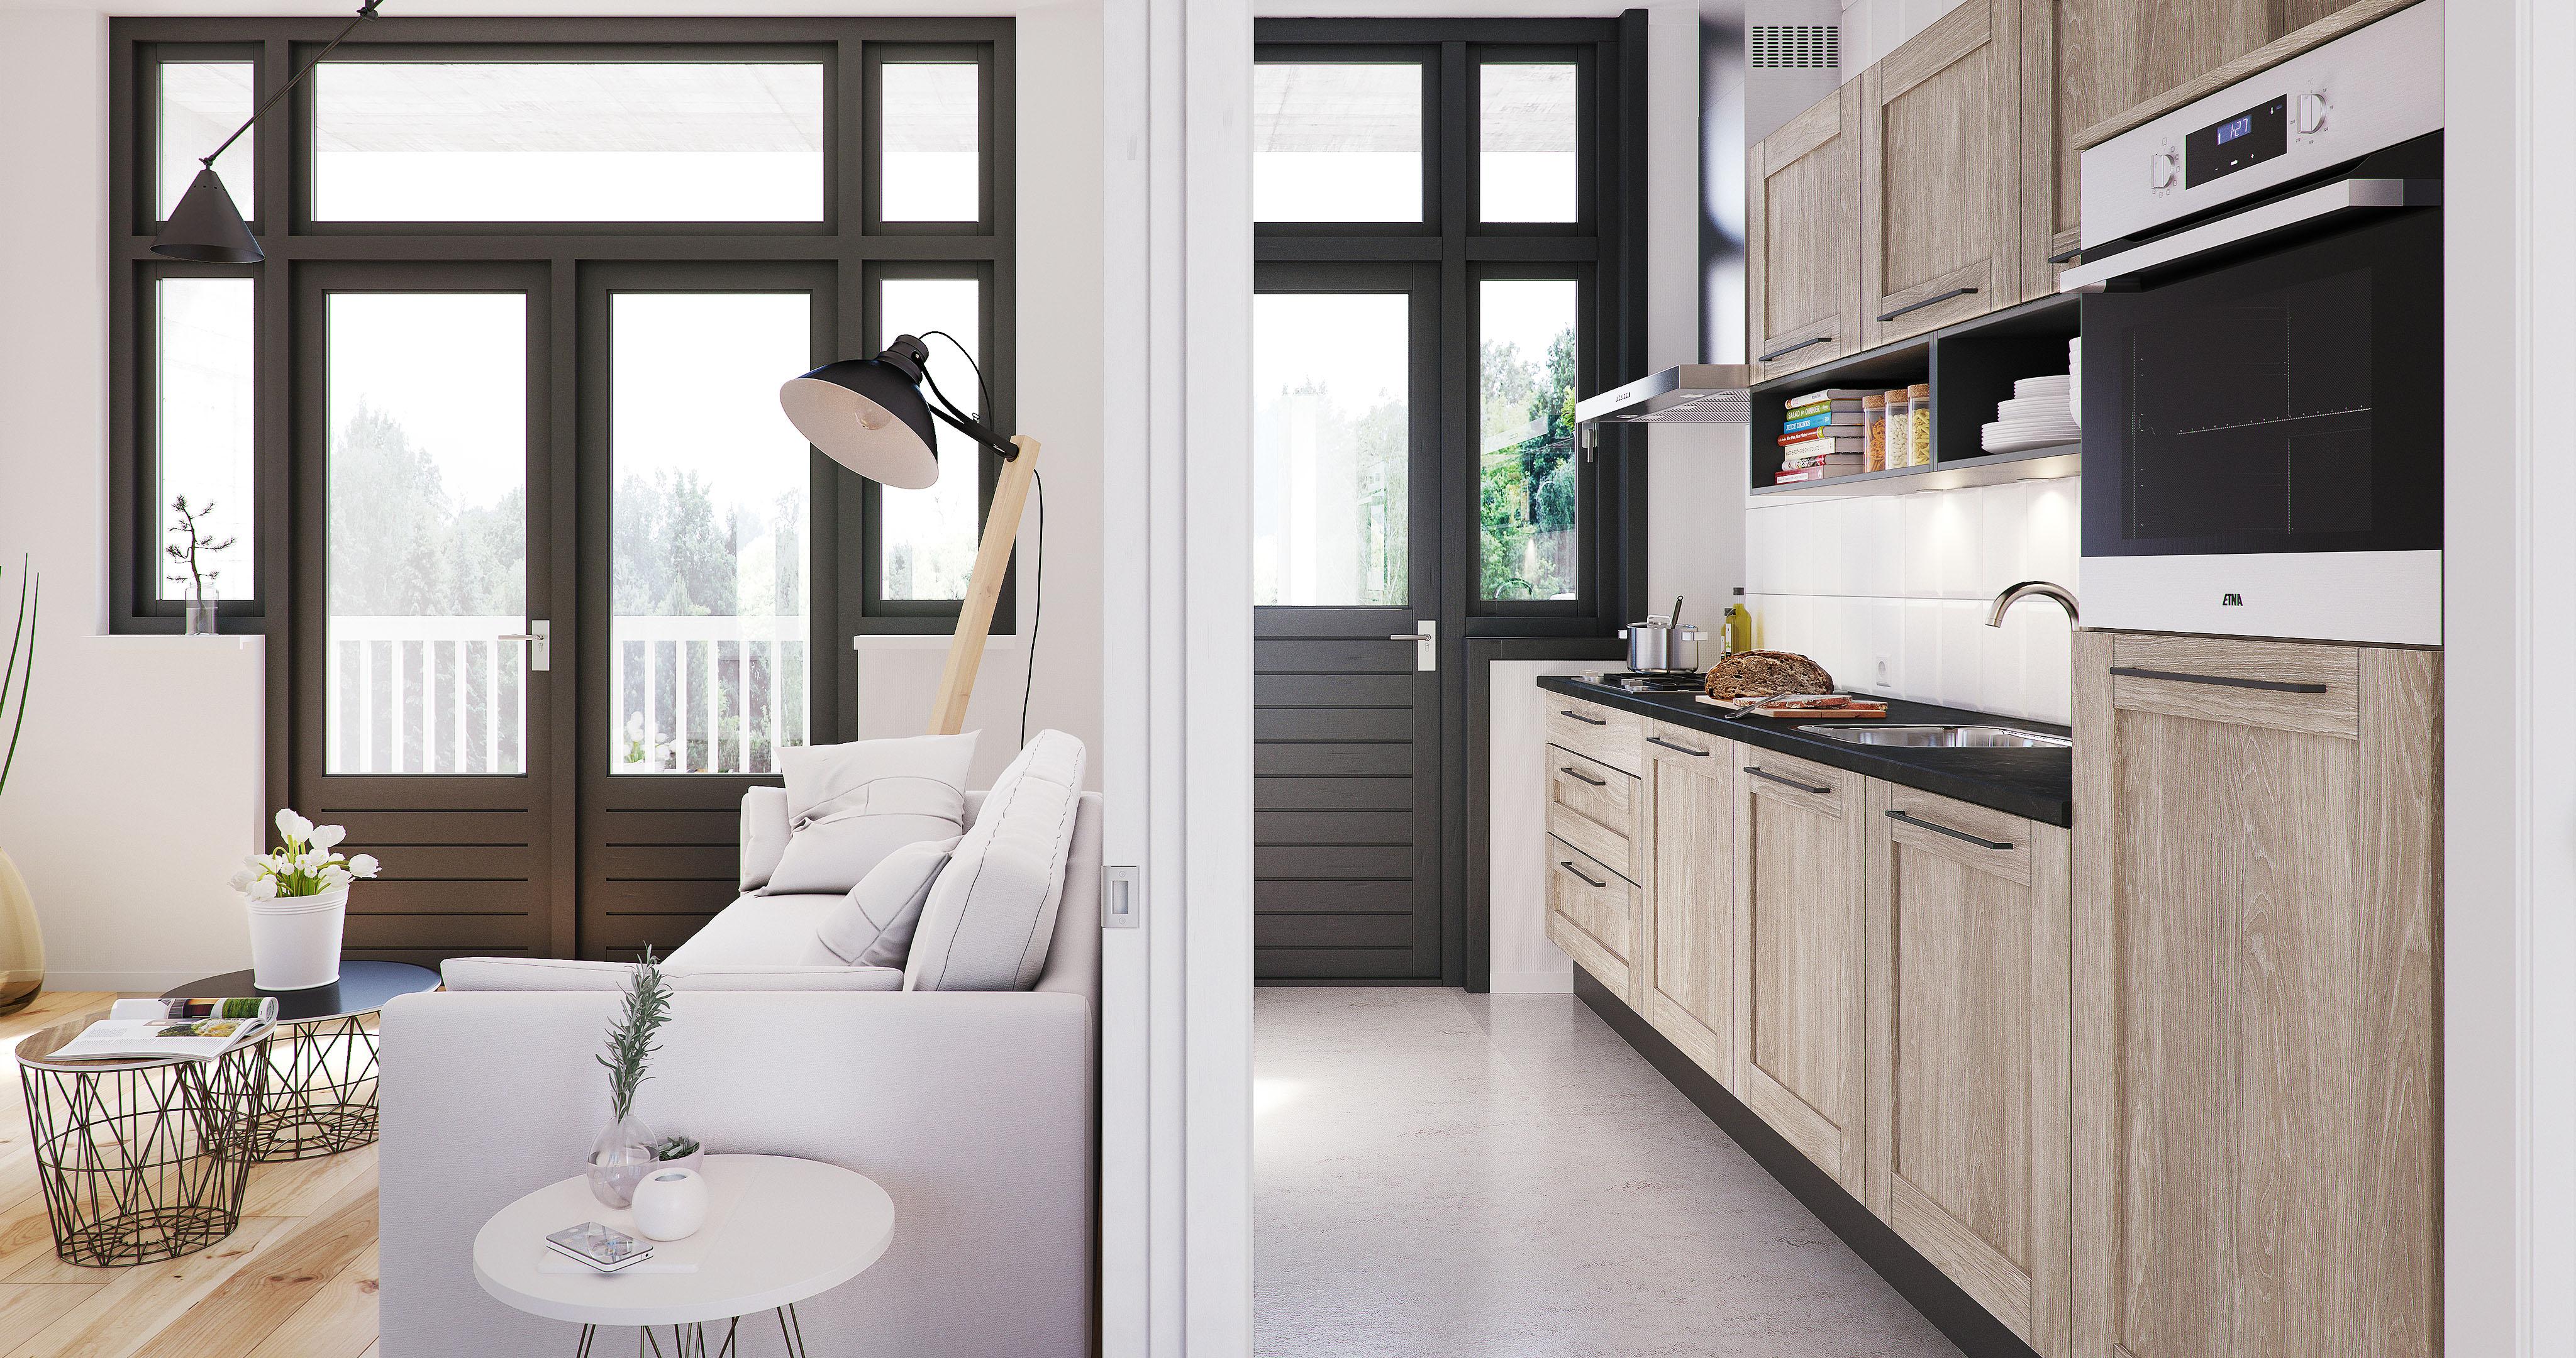 Bruynzeel keukens breda artistiek bruynzeel keukens ervaringen